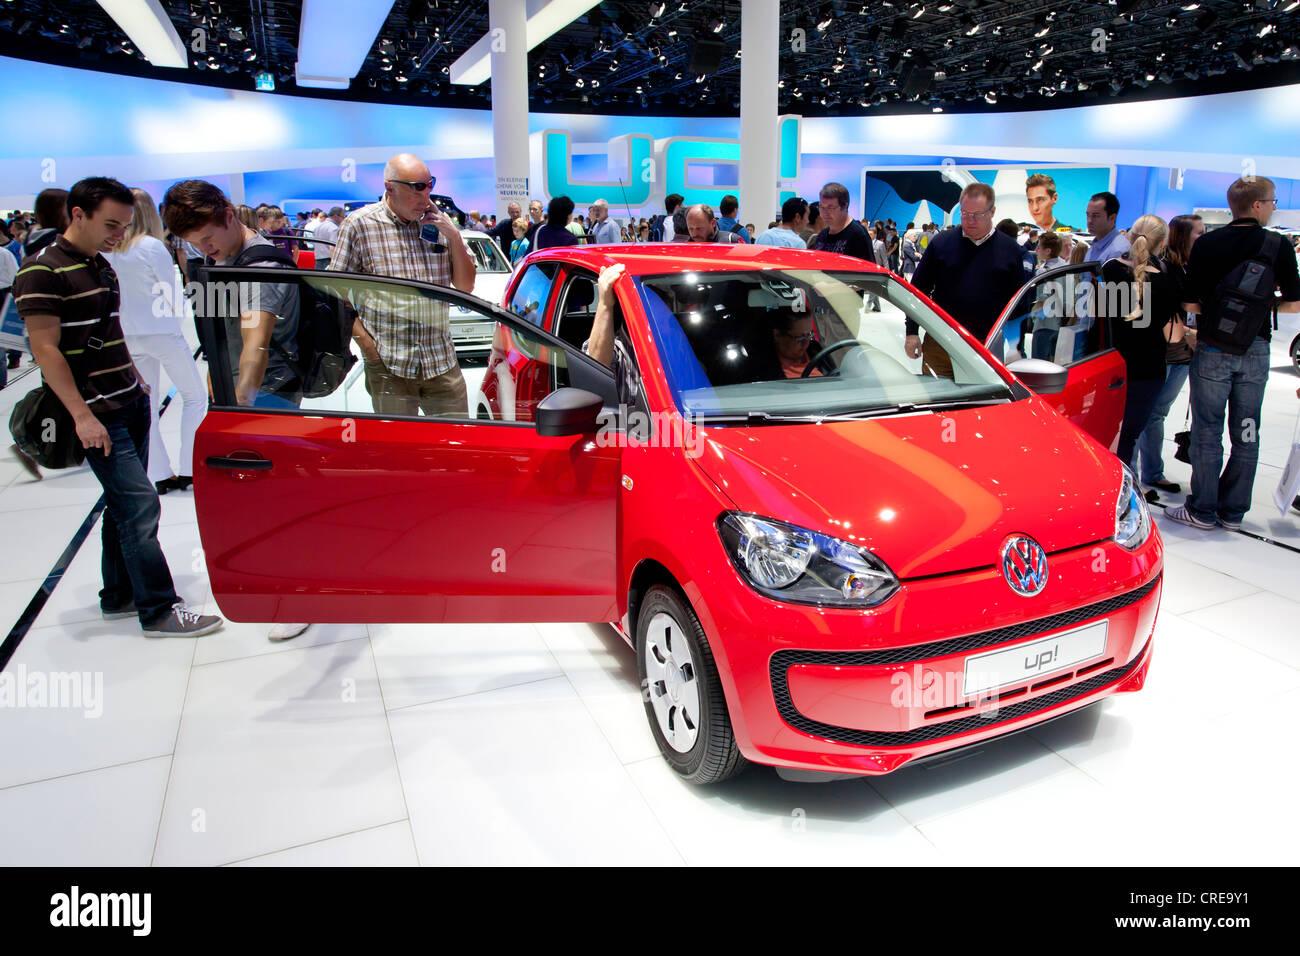 Volkswagen, VW up, 64th International Motor Show, IAA, 2011, Frankfurt am Main, Hesse, Germany, Europe - Stock Image